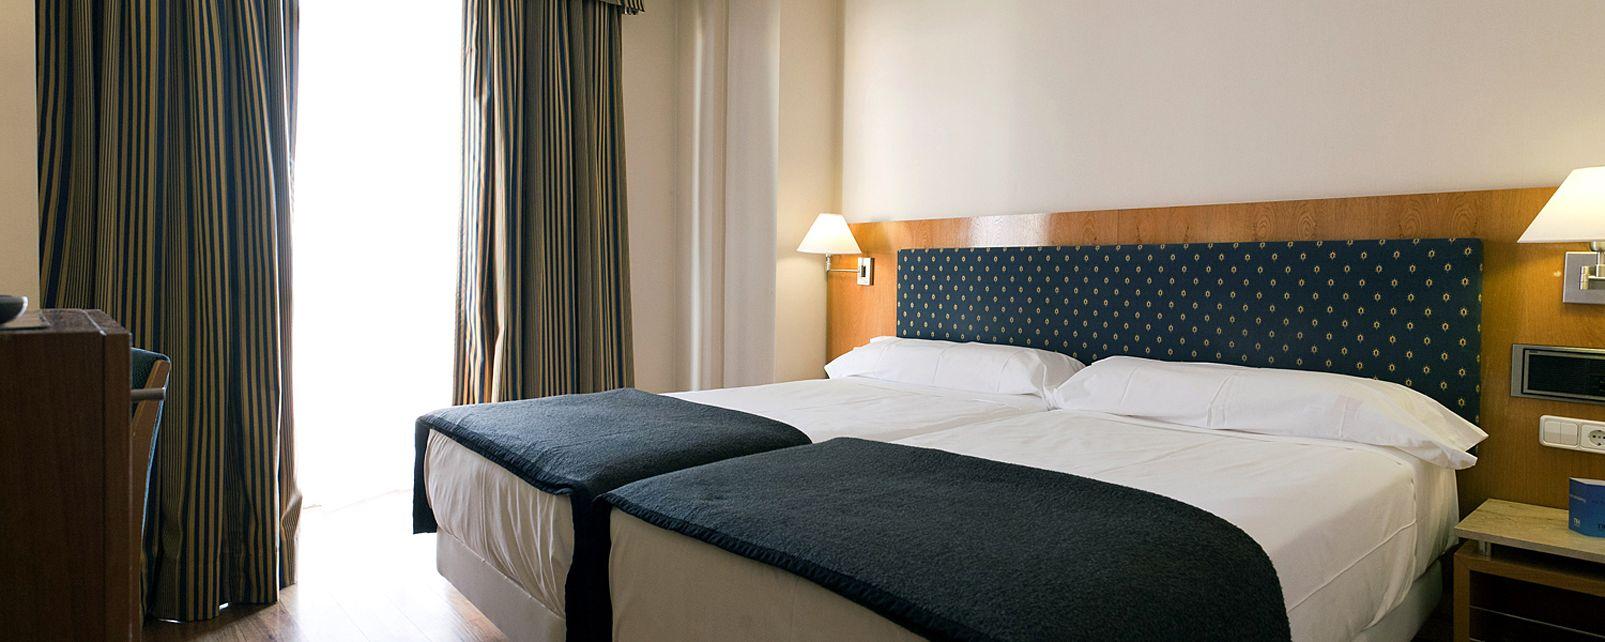 Hotel NH Practico